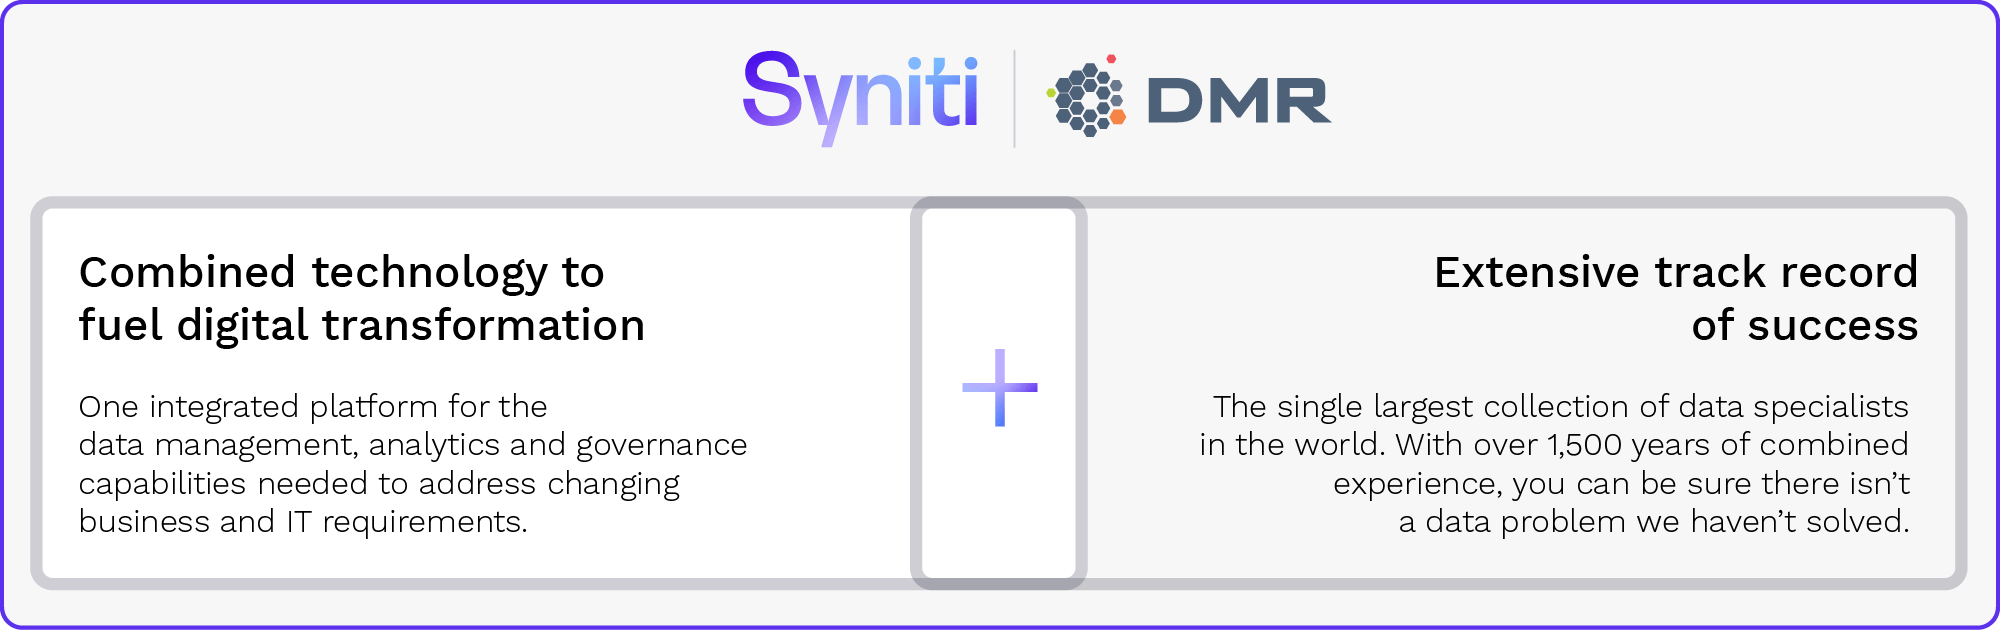 Syniti DMR - Merger Benefits